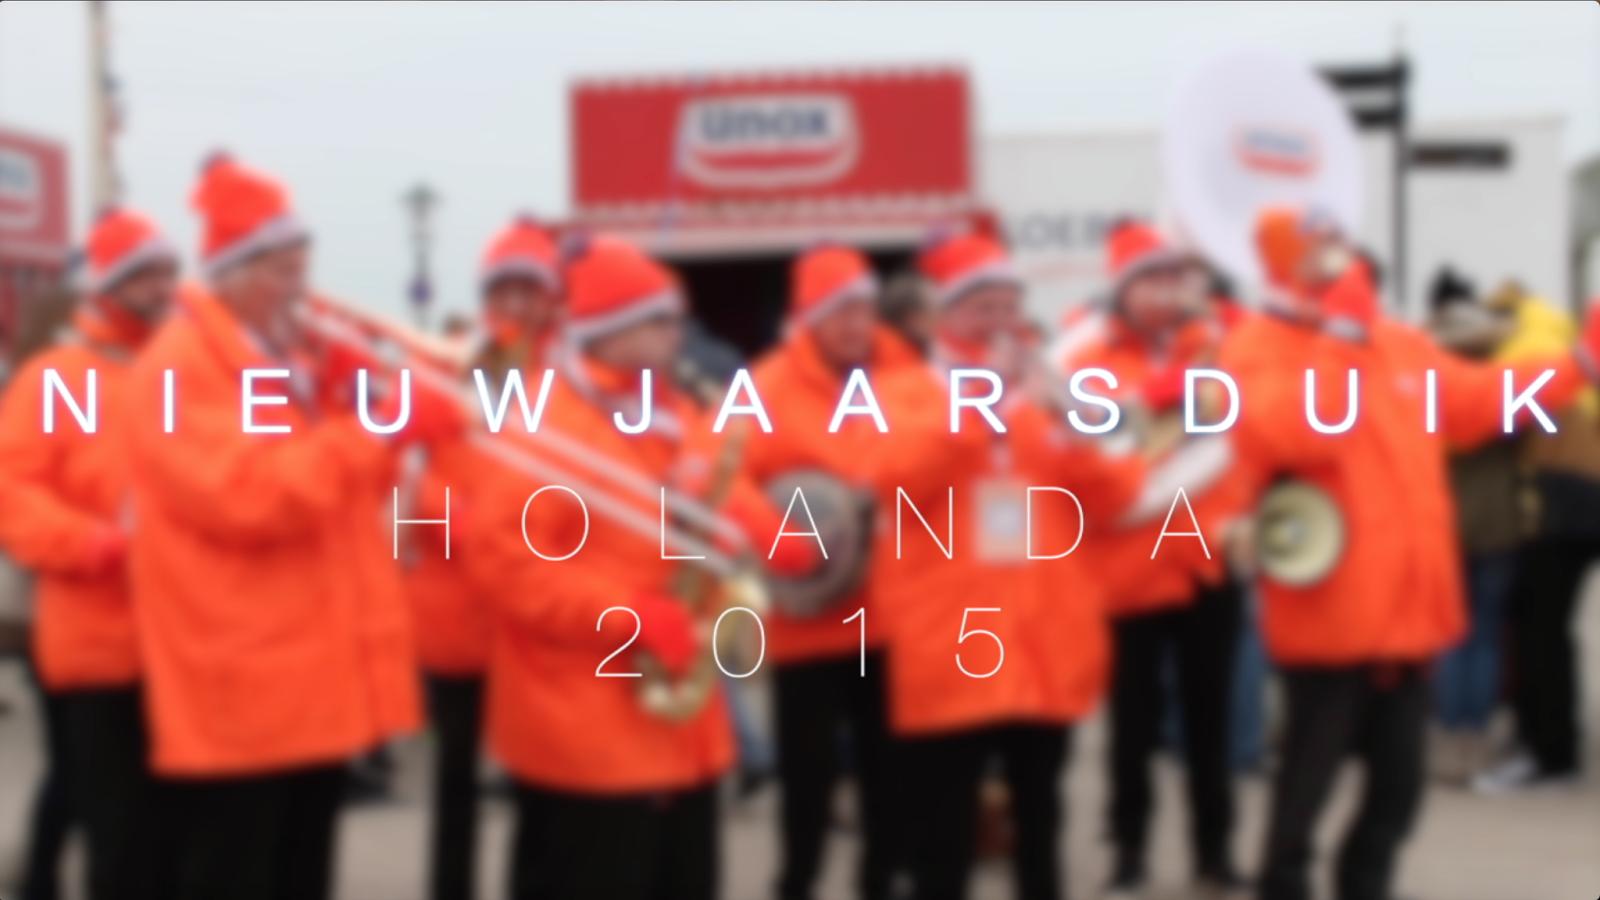 Vídeo Nieuwjaarsduik 2015